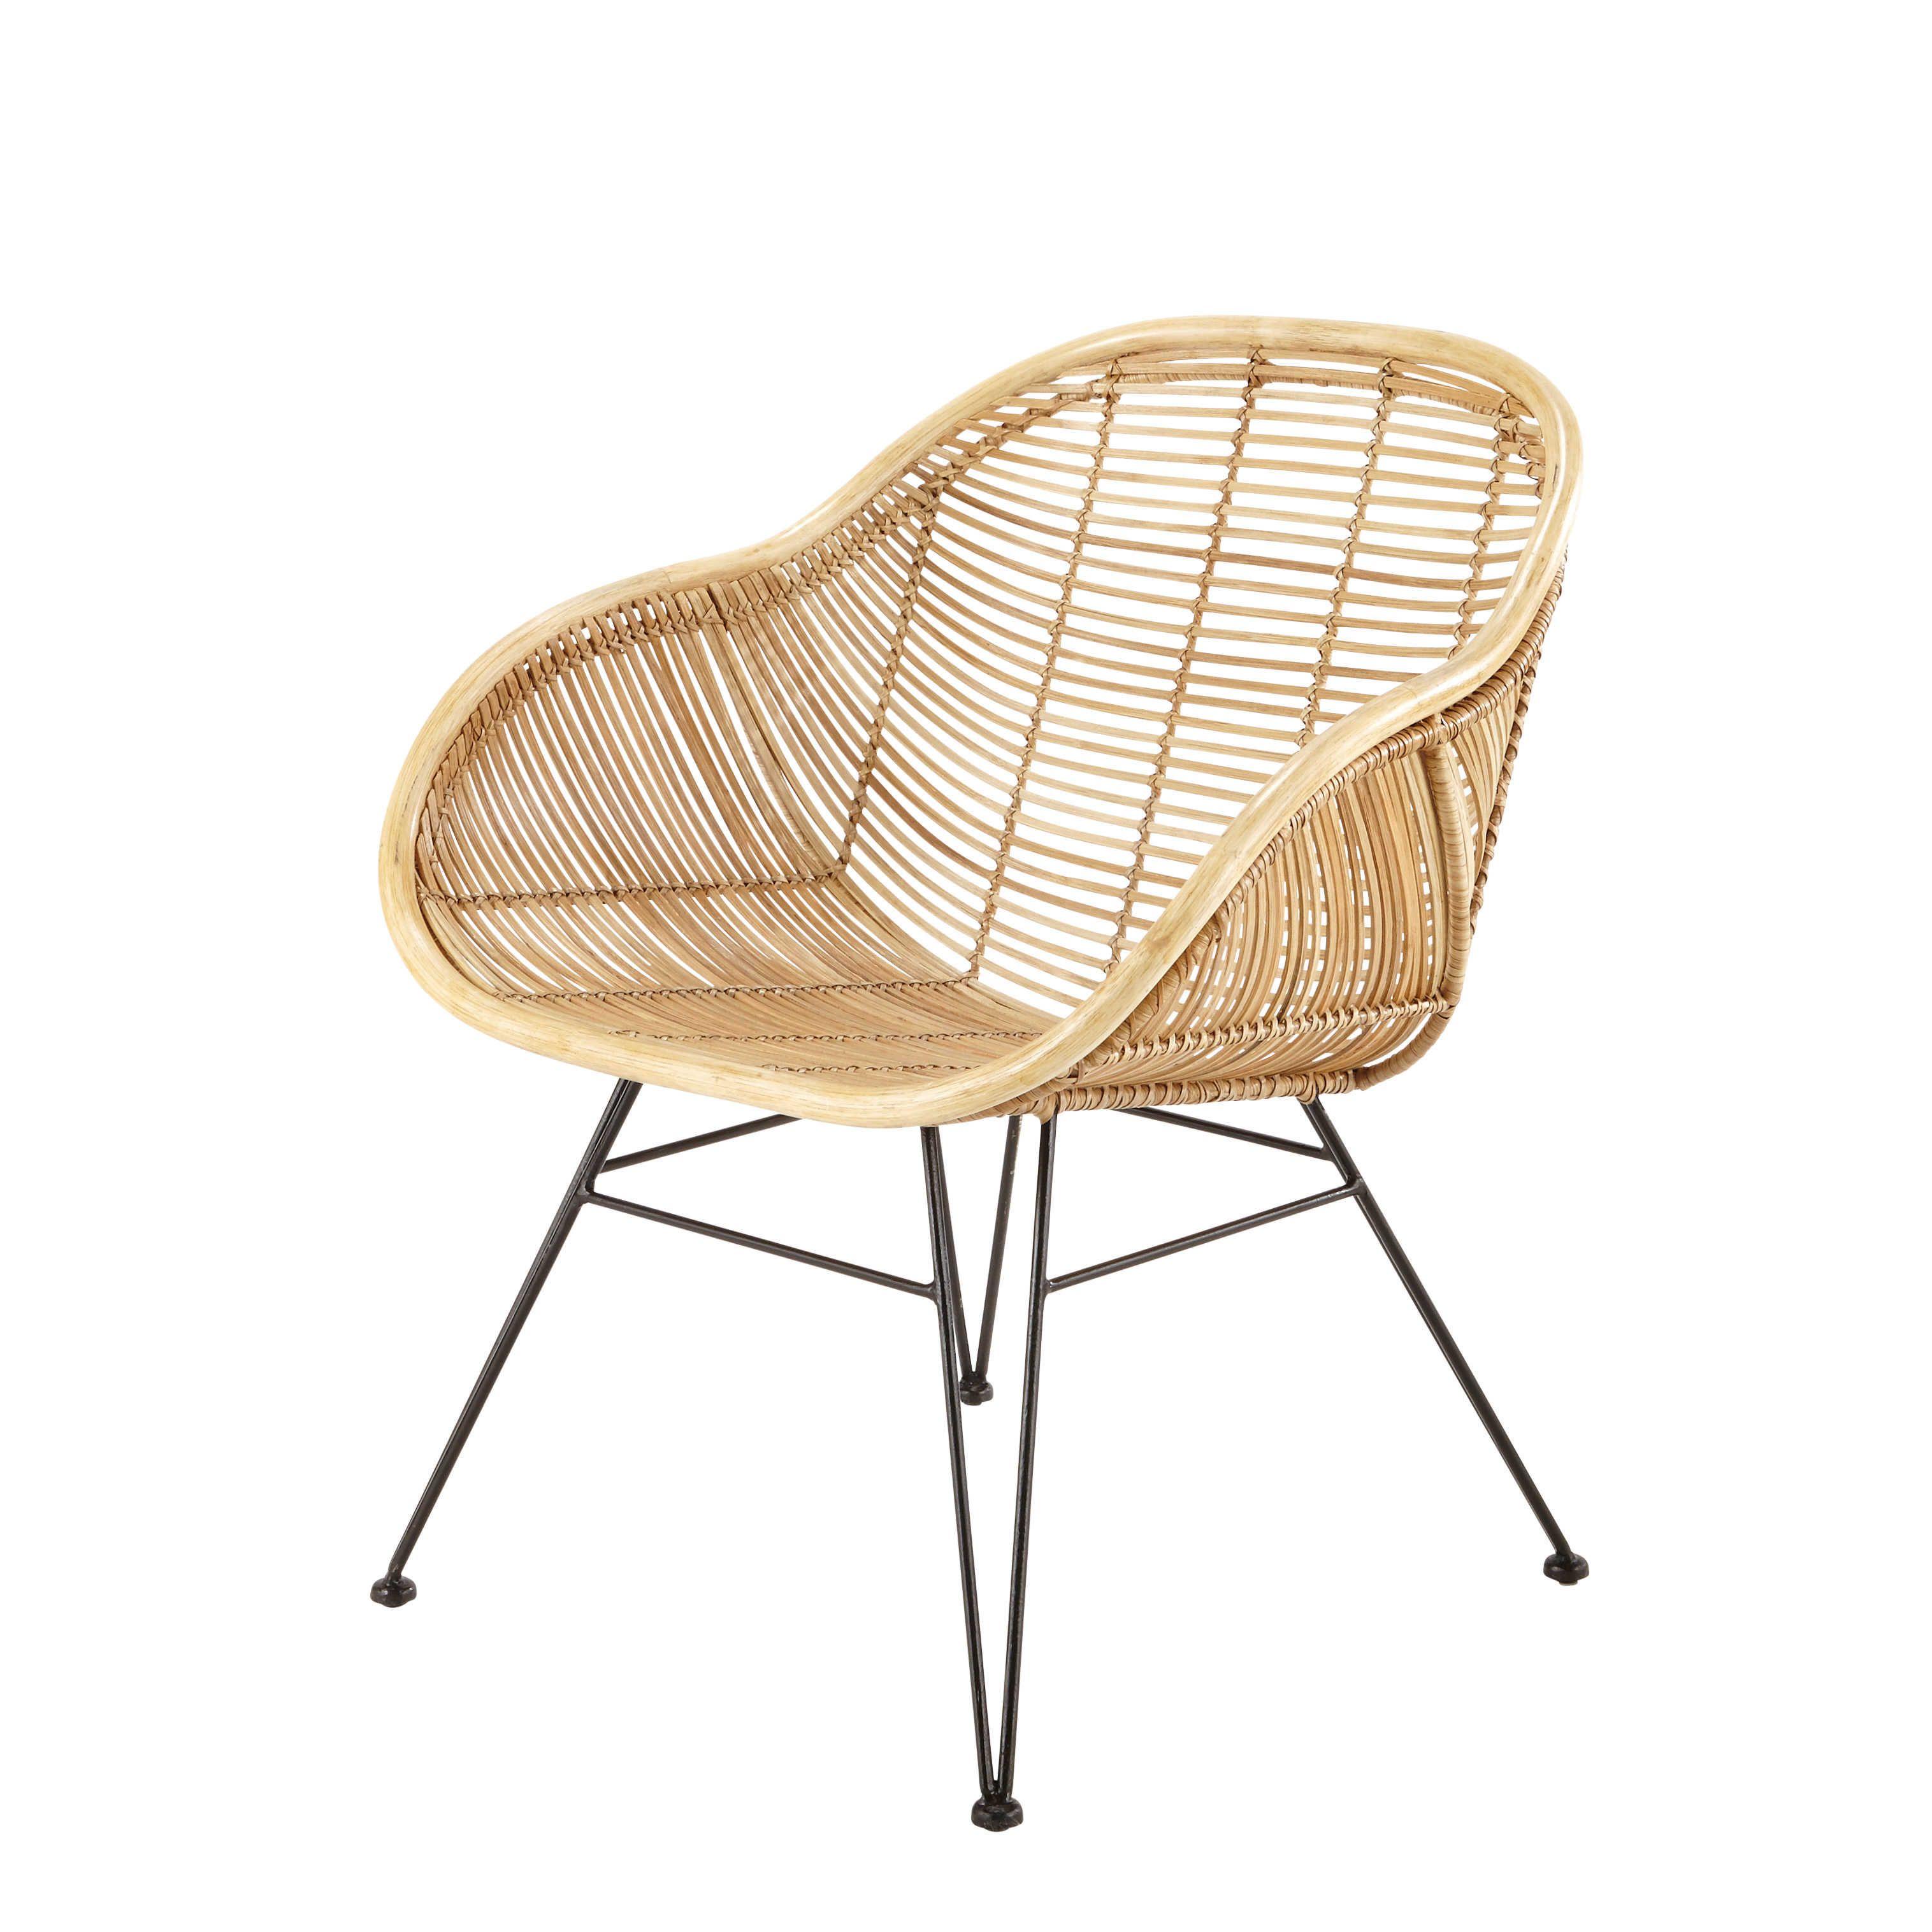 rotan stoel pitaya home in 2019 pinterest rotan stoelen stoelen en rotan. Black Bedroom Furniture Sets. Home Design Ideas